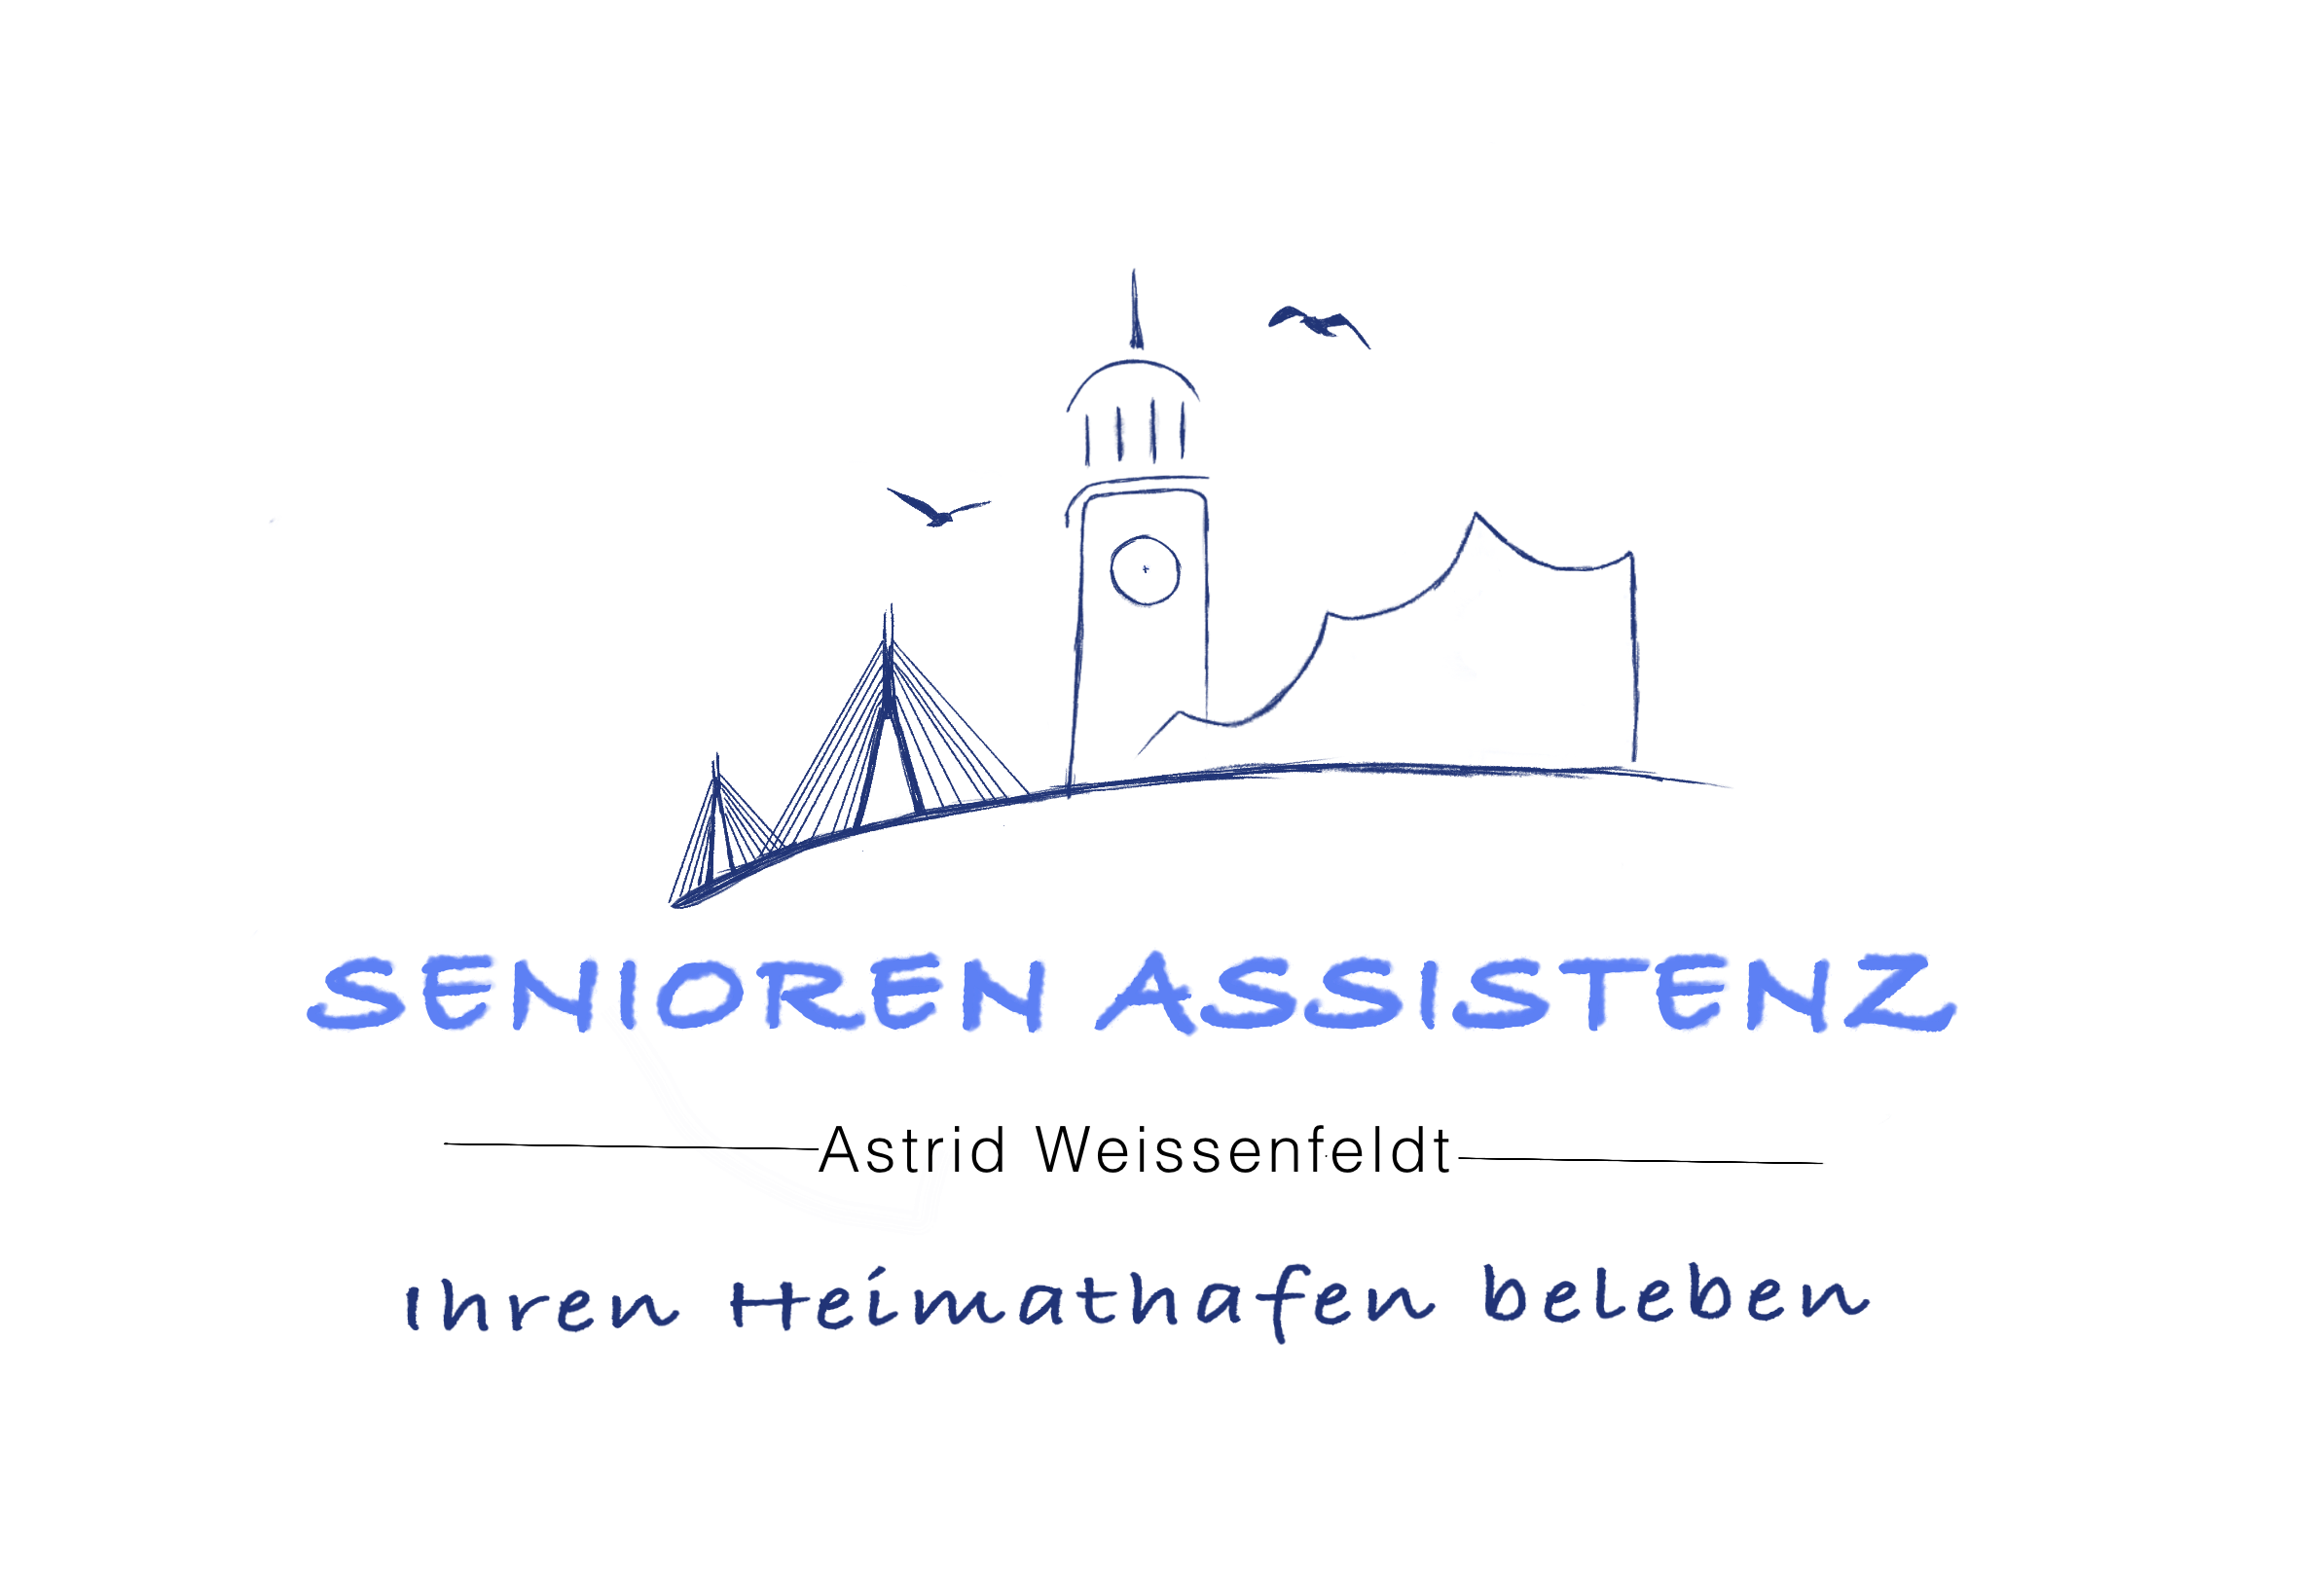 seniorenassistenz-weissenfeldt.de